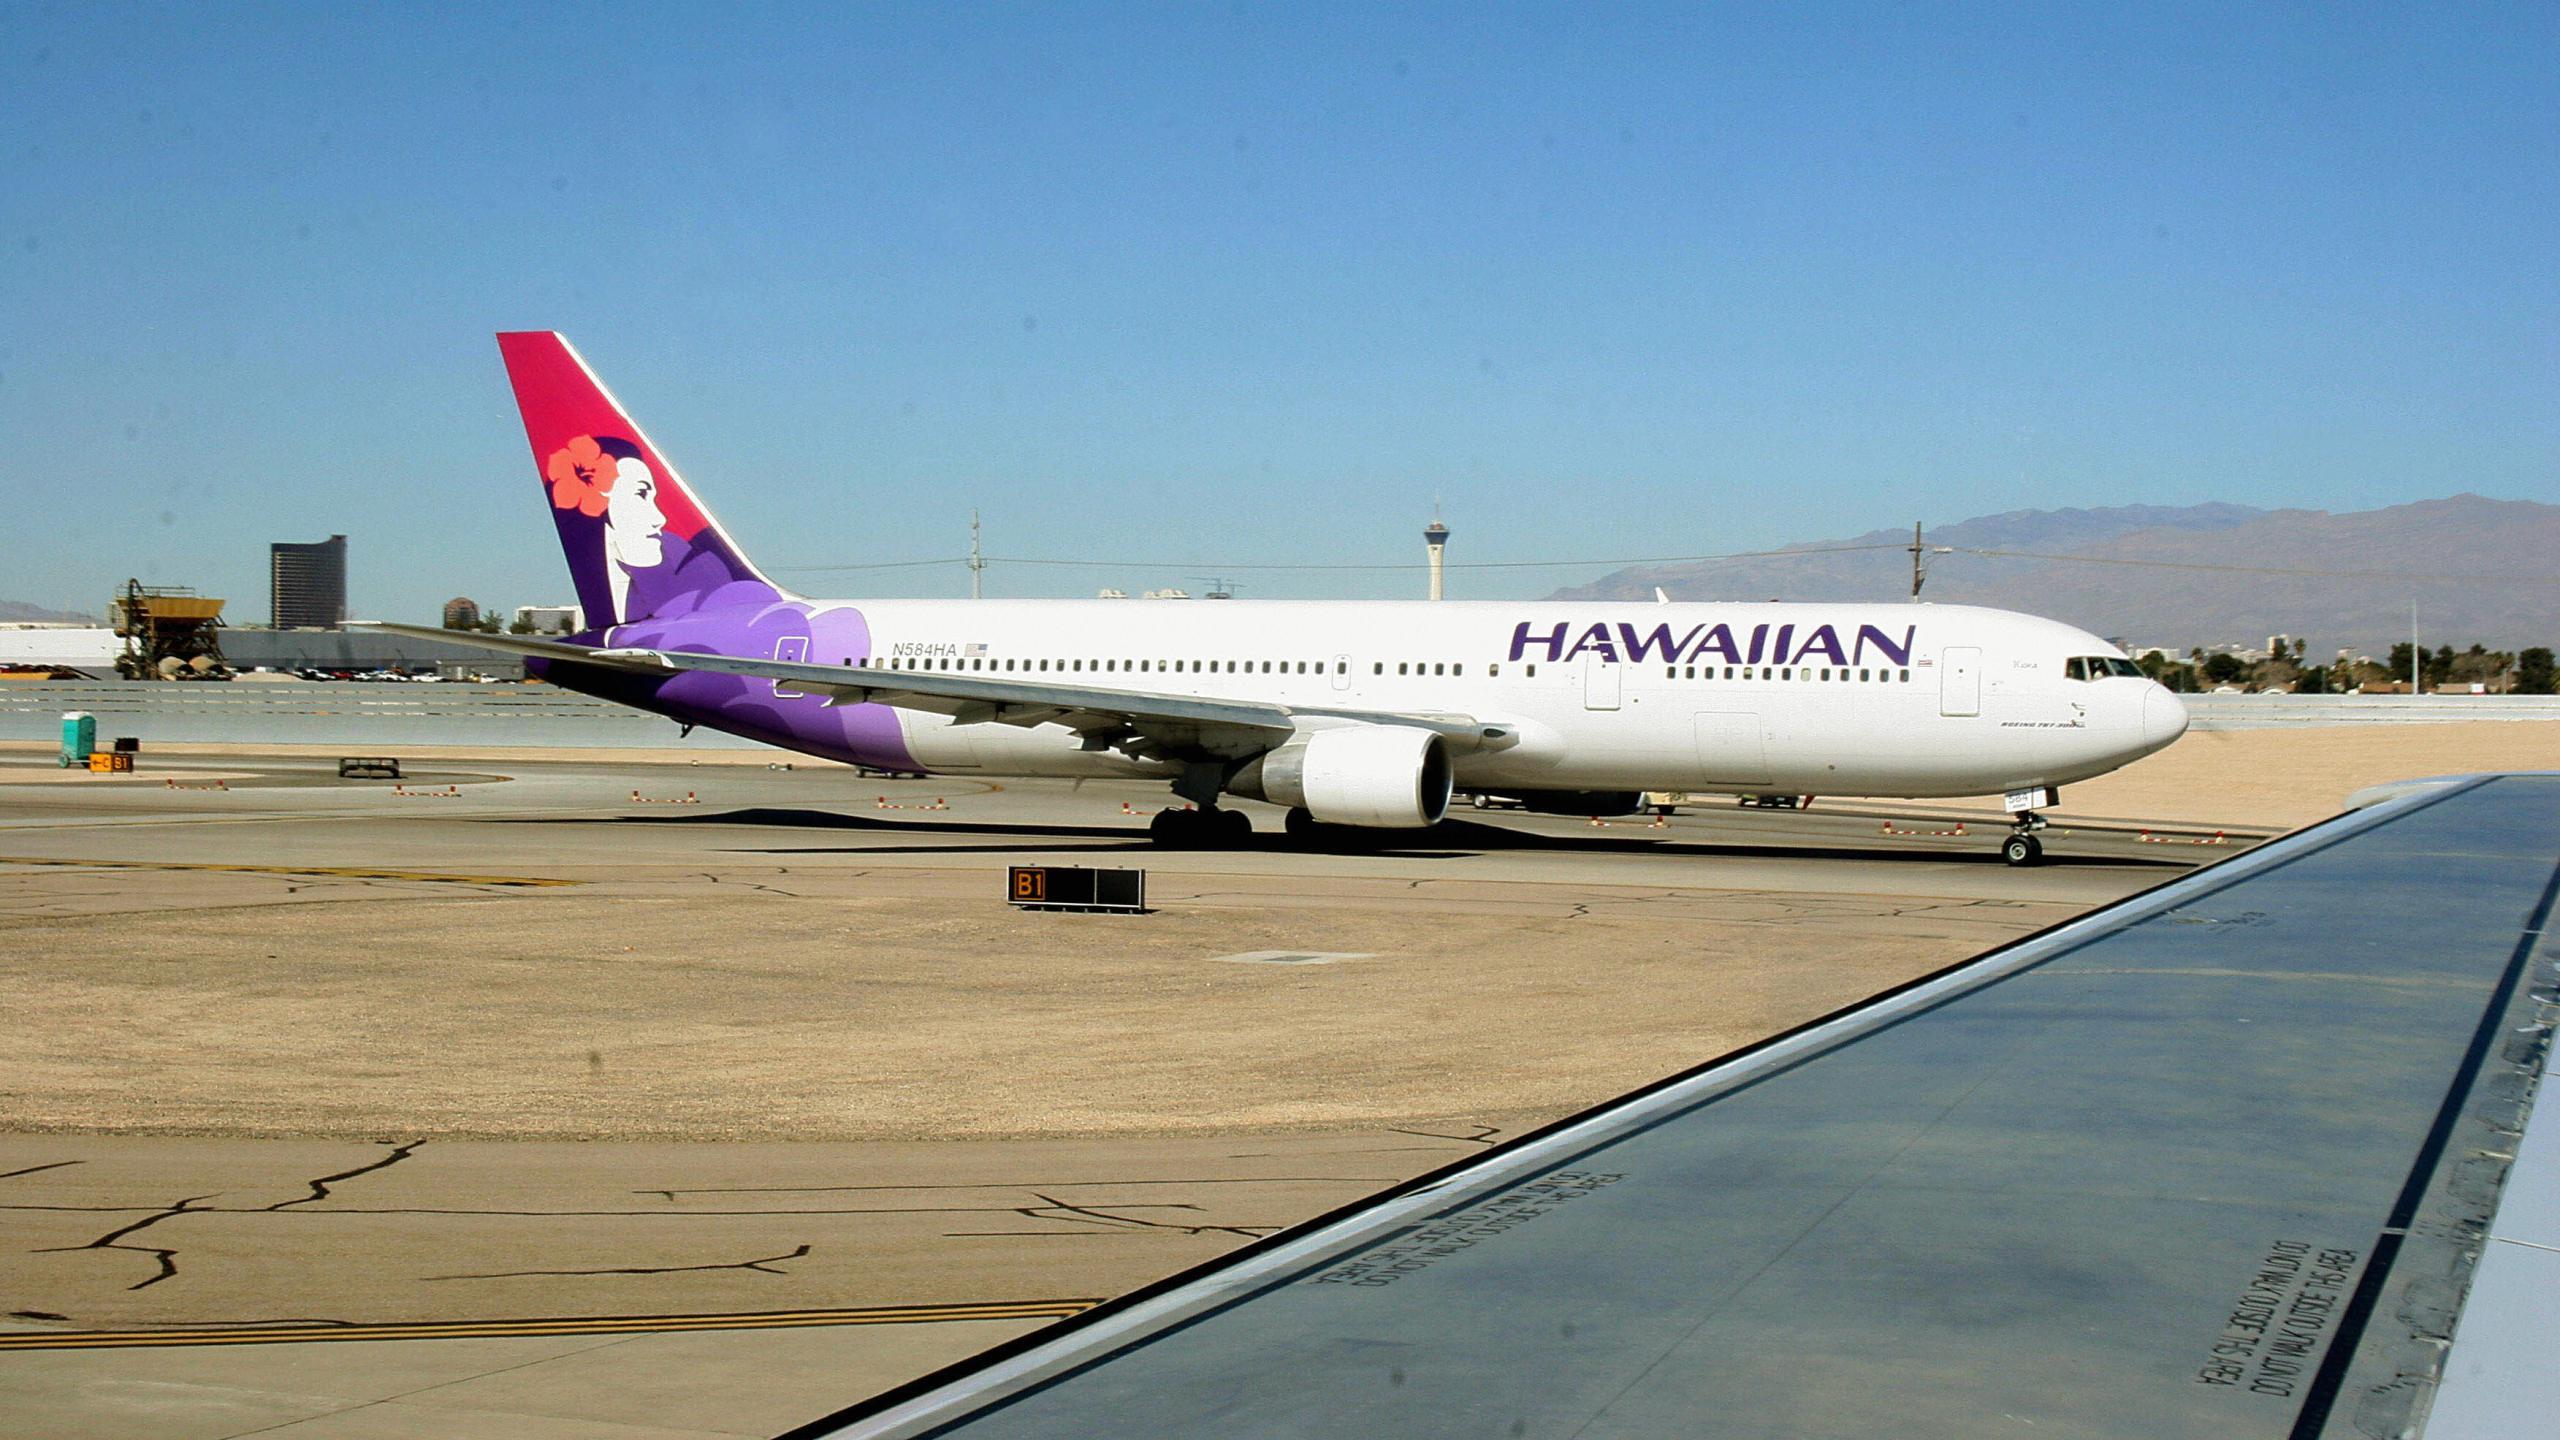 GettyImages - Hawaiian Airlines نرخ پروازهای داخلی و خارجی را تغییر نمی دهد